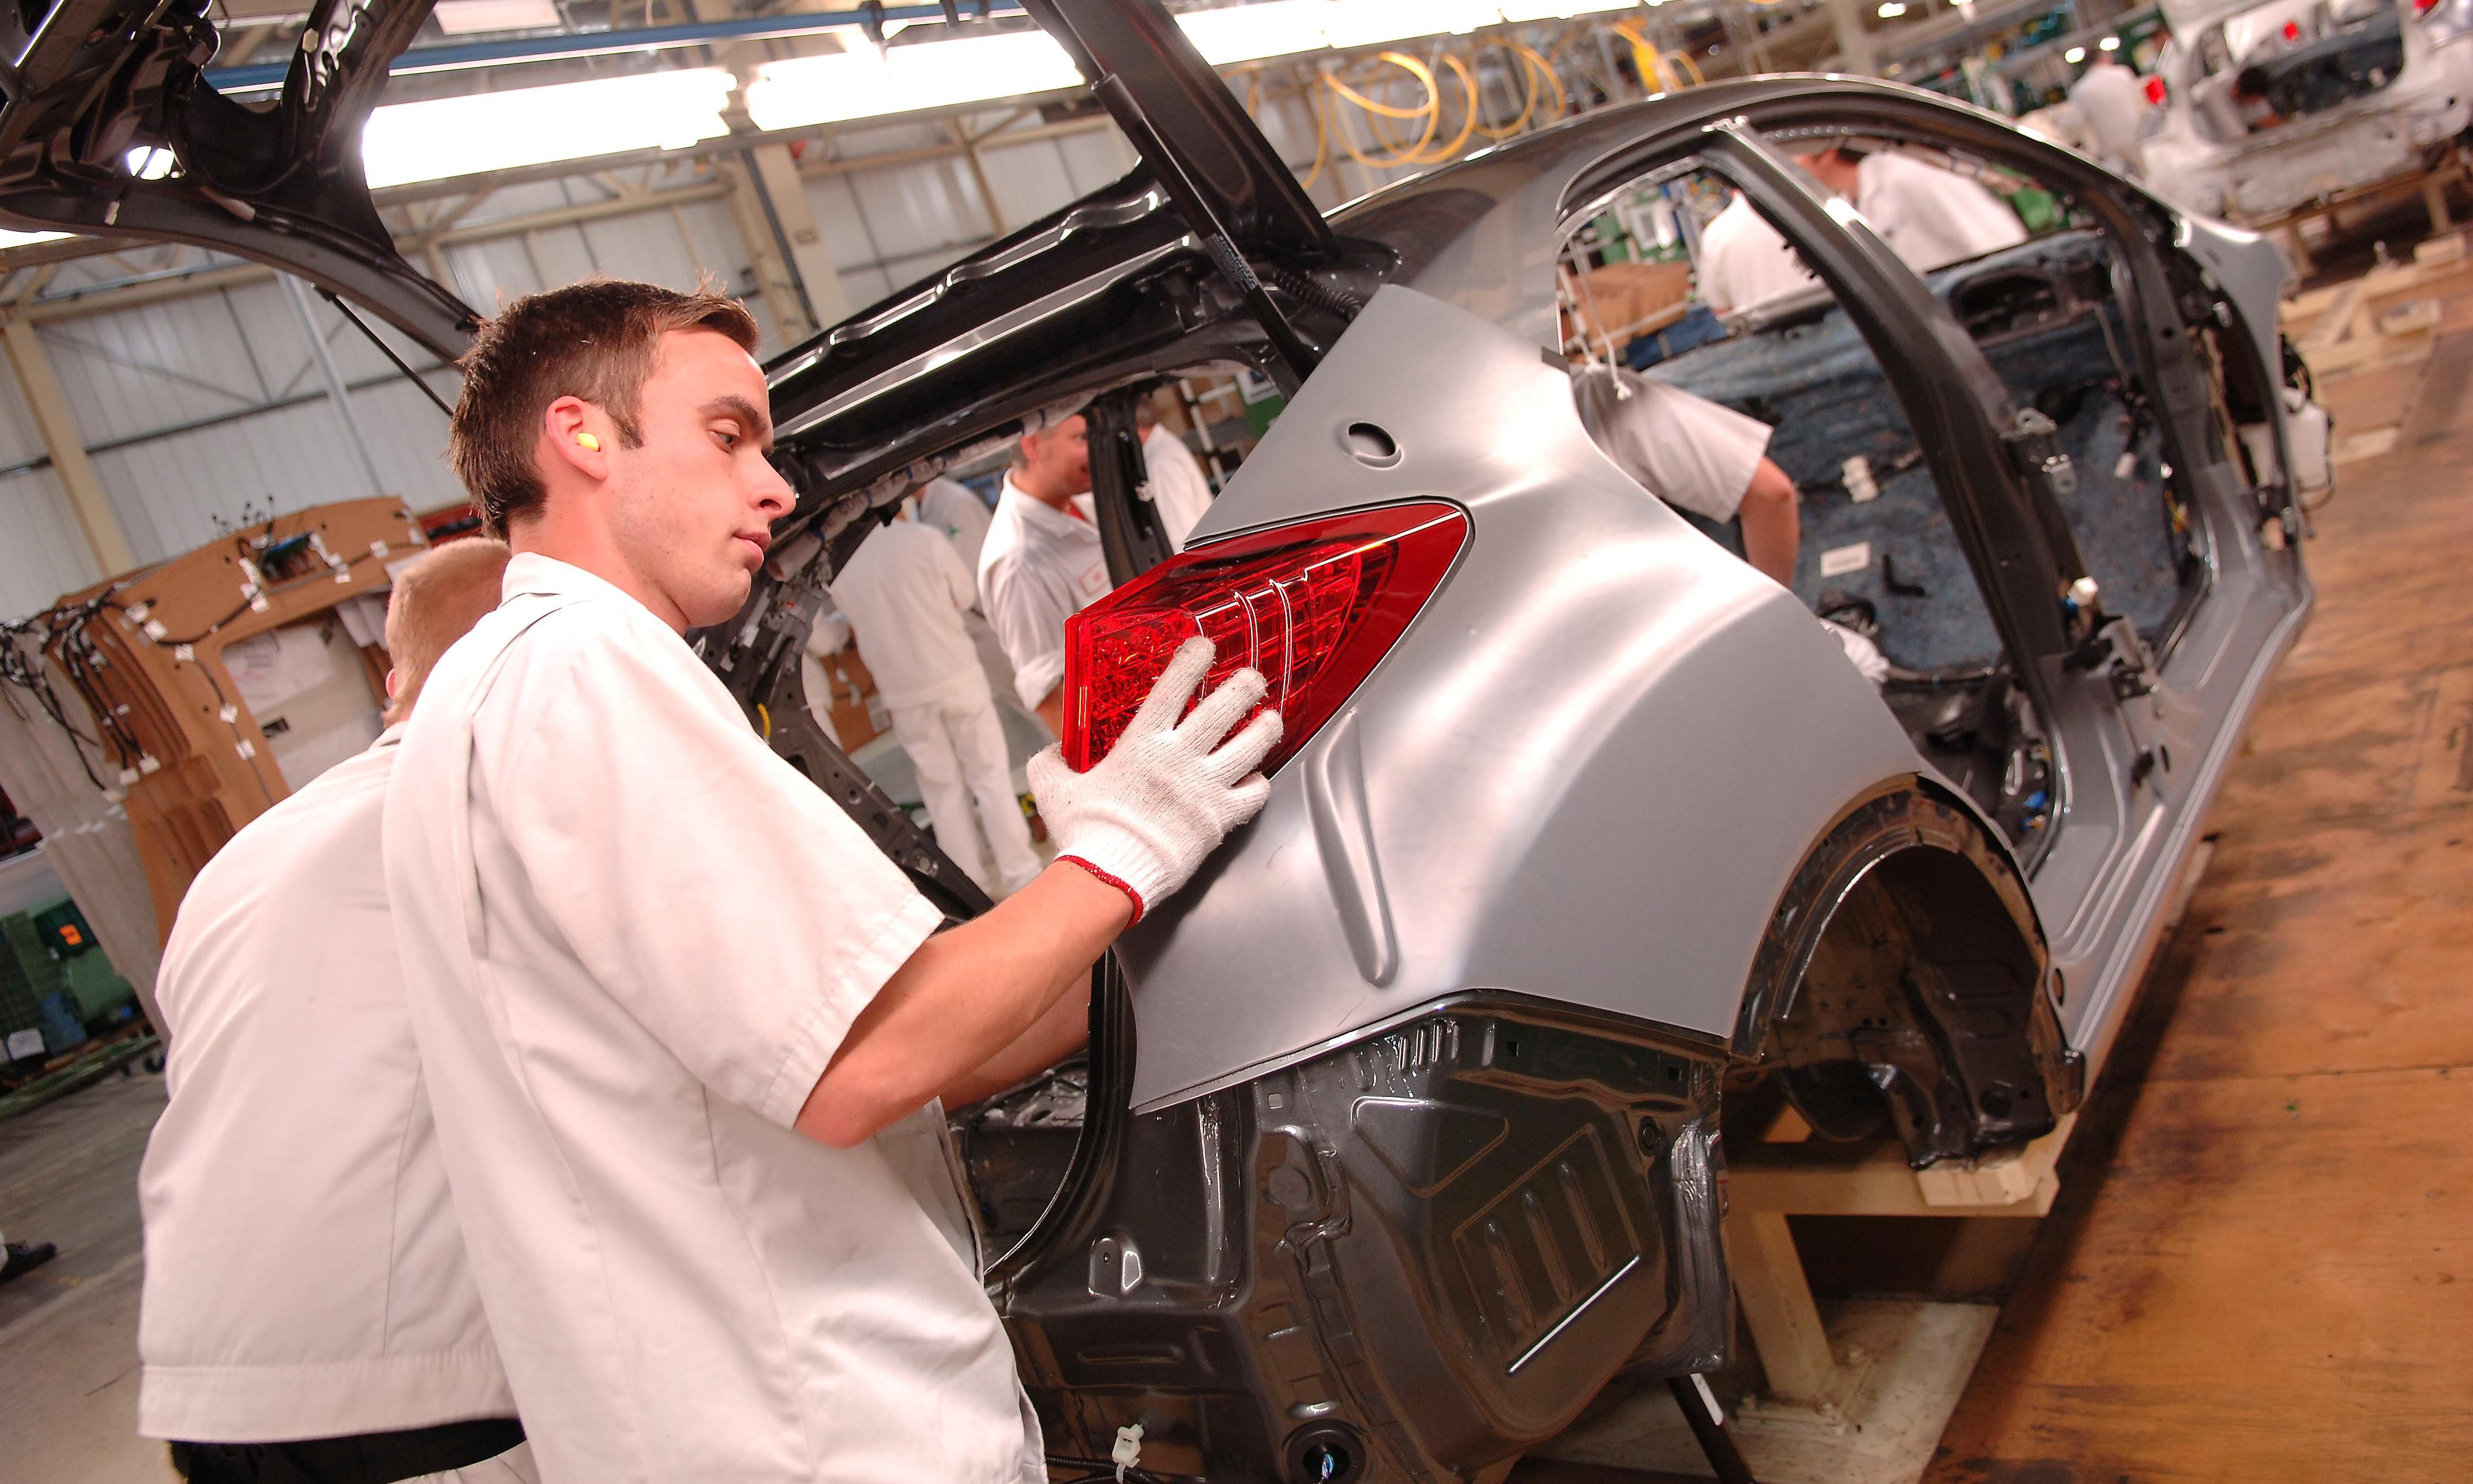 Carmaker Honda plans to close Swindon factory – reports